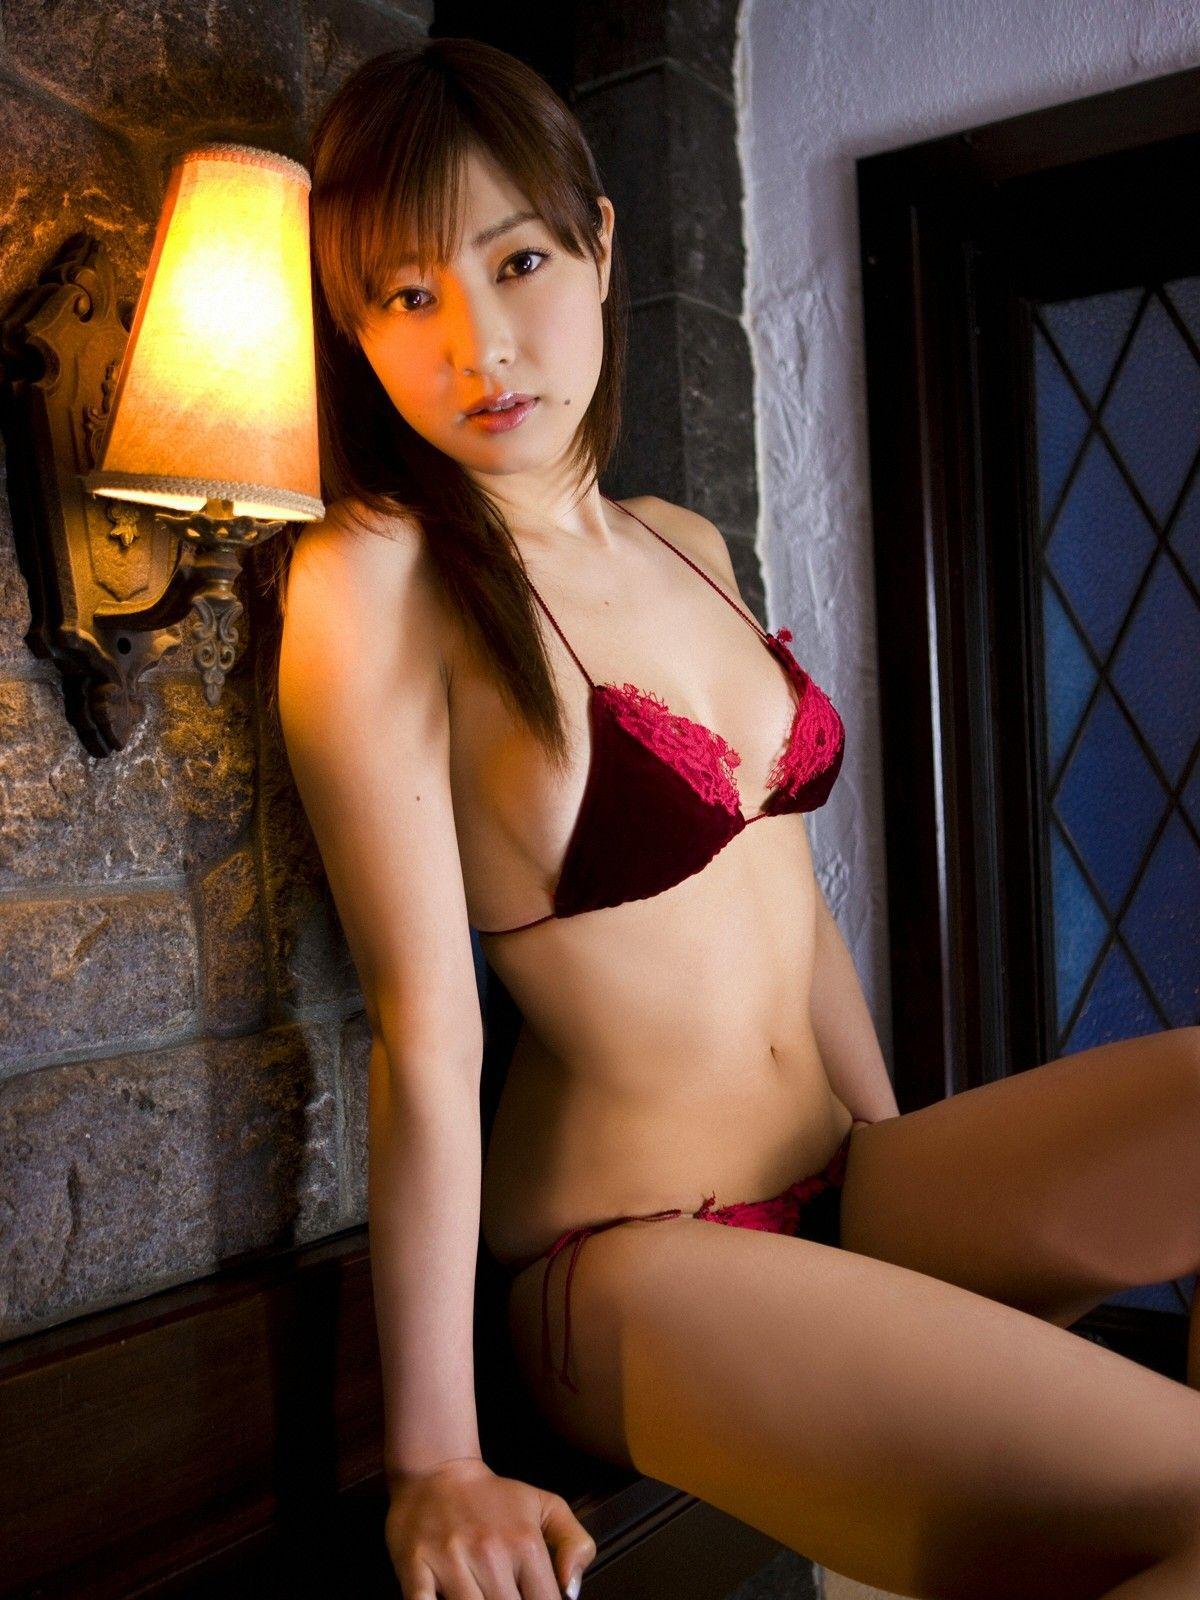 [Sabra]池田夏希(大森美希)超高清写真大图片(80P) 155热度